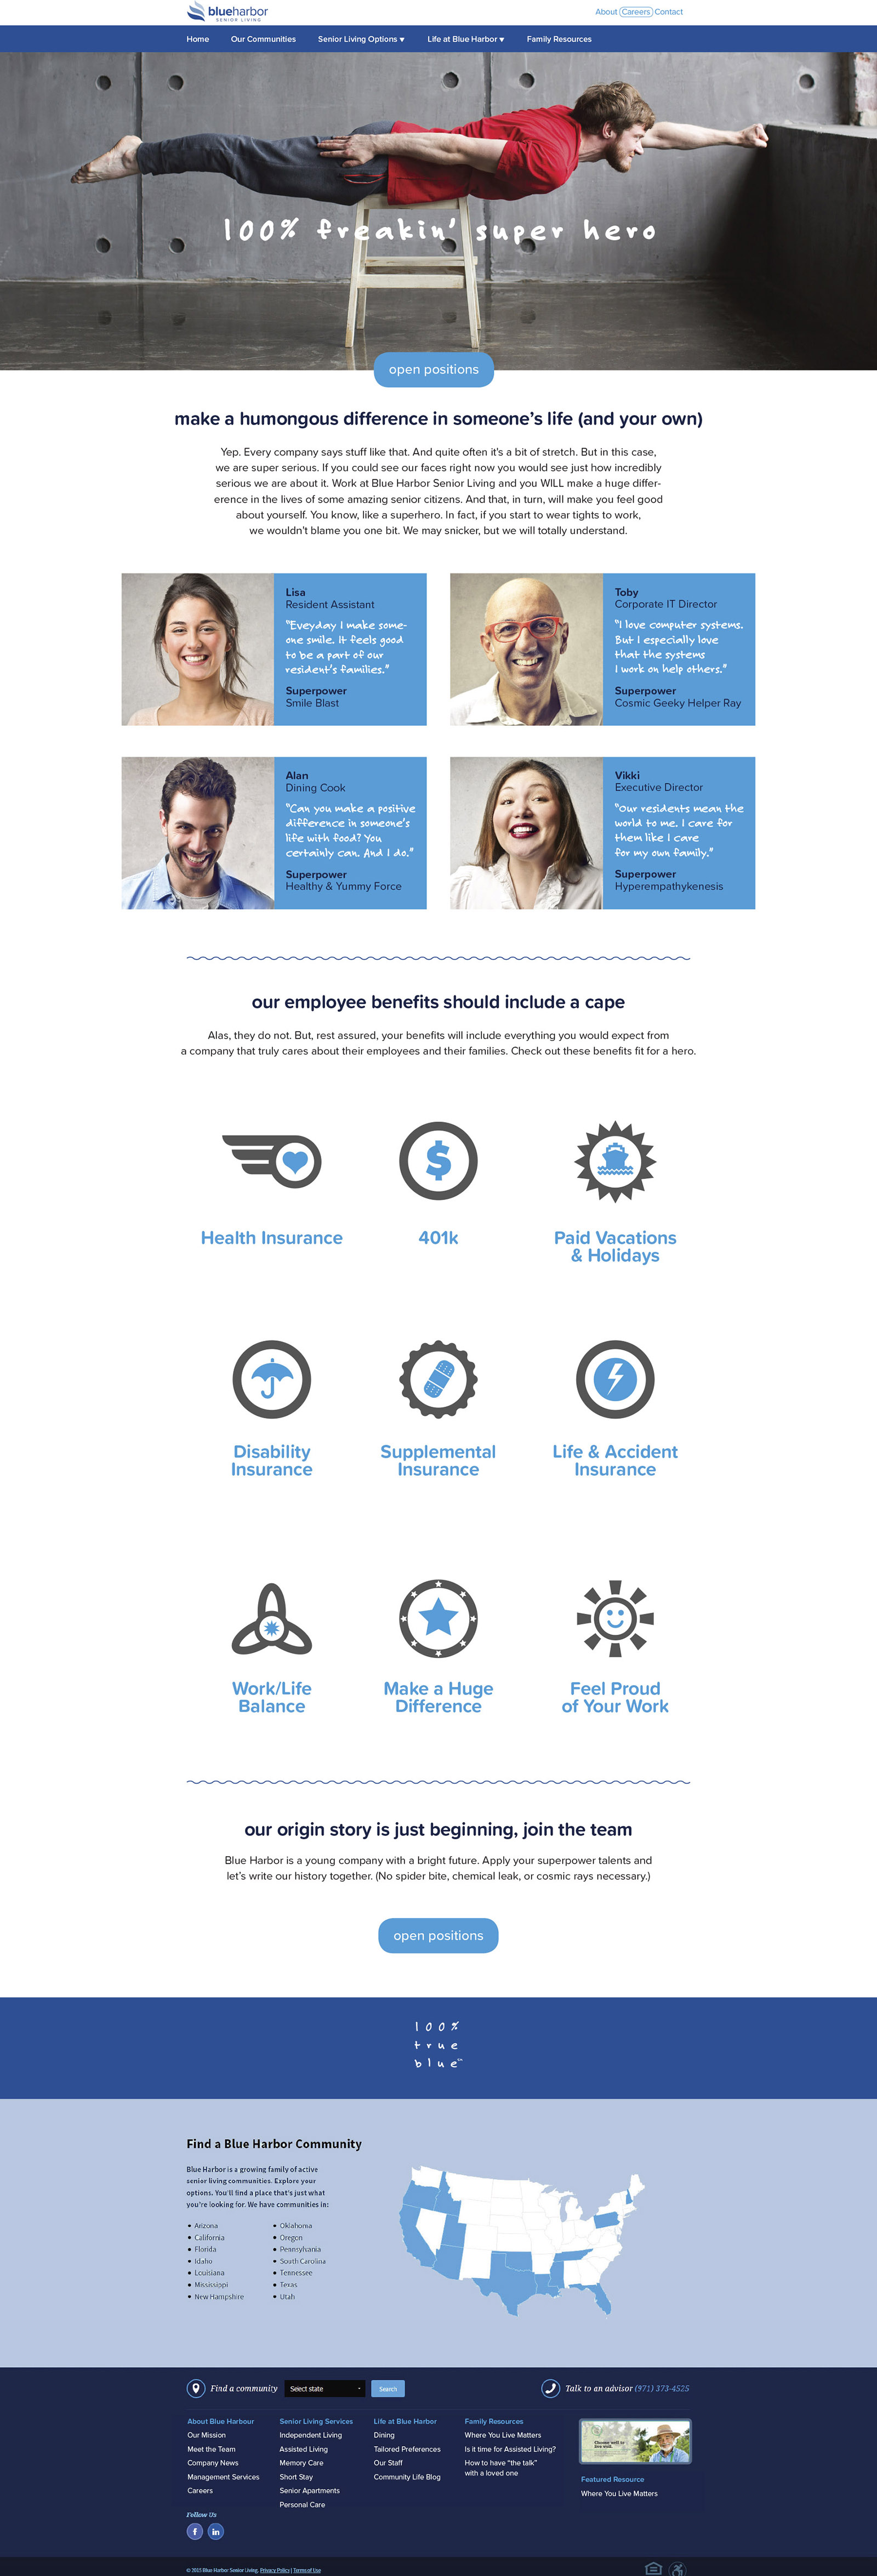 Blue Harbor Senior Living - Careers Website Marketing